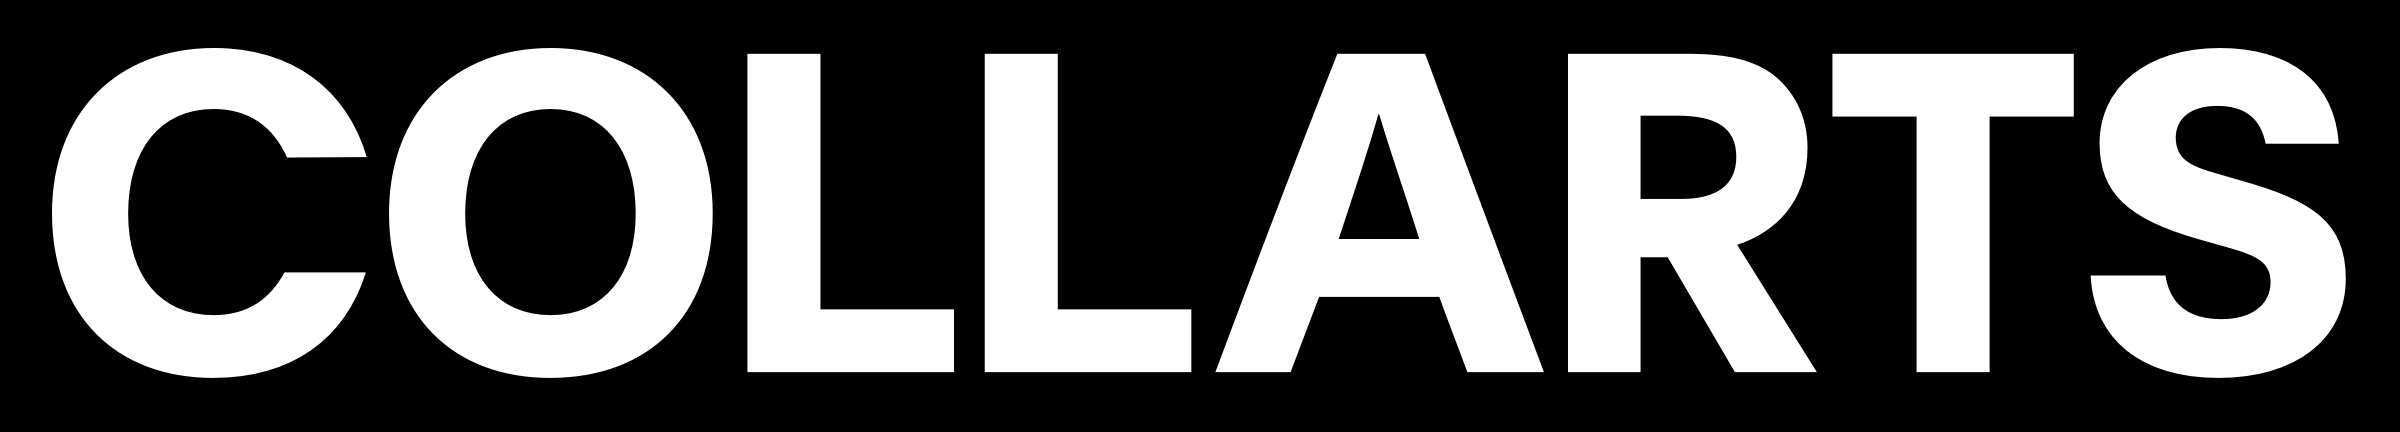 Collarts Logo - white on black